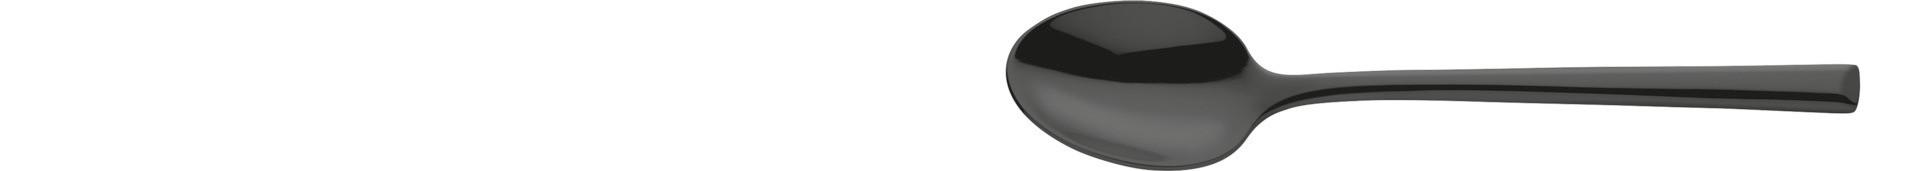 Metropole PVD, Moccalöffel 114 mm PVD schwarz